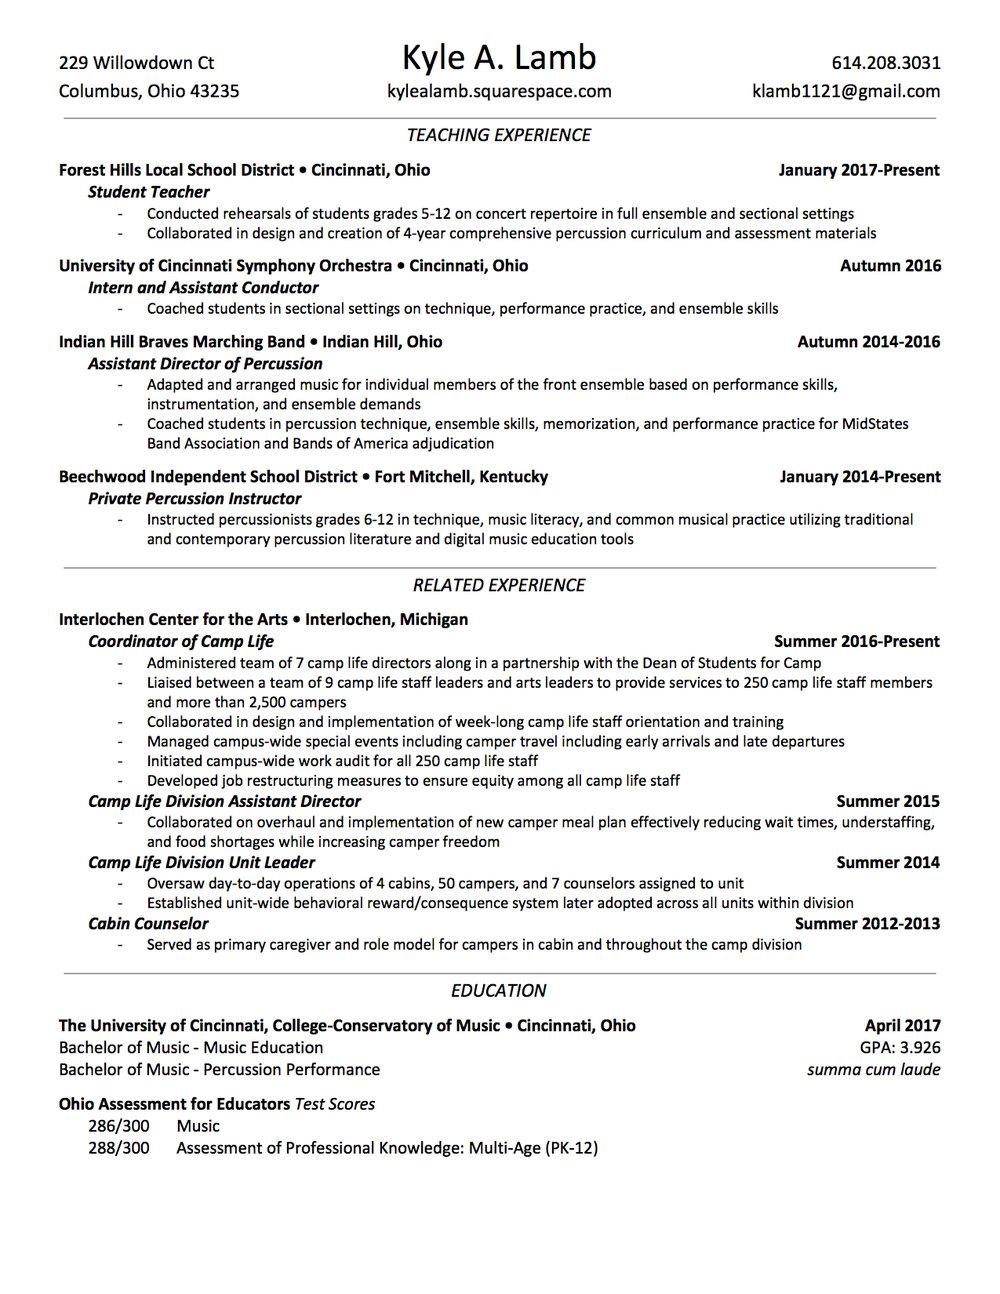 Education Resume — Kyle A. Lamb